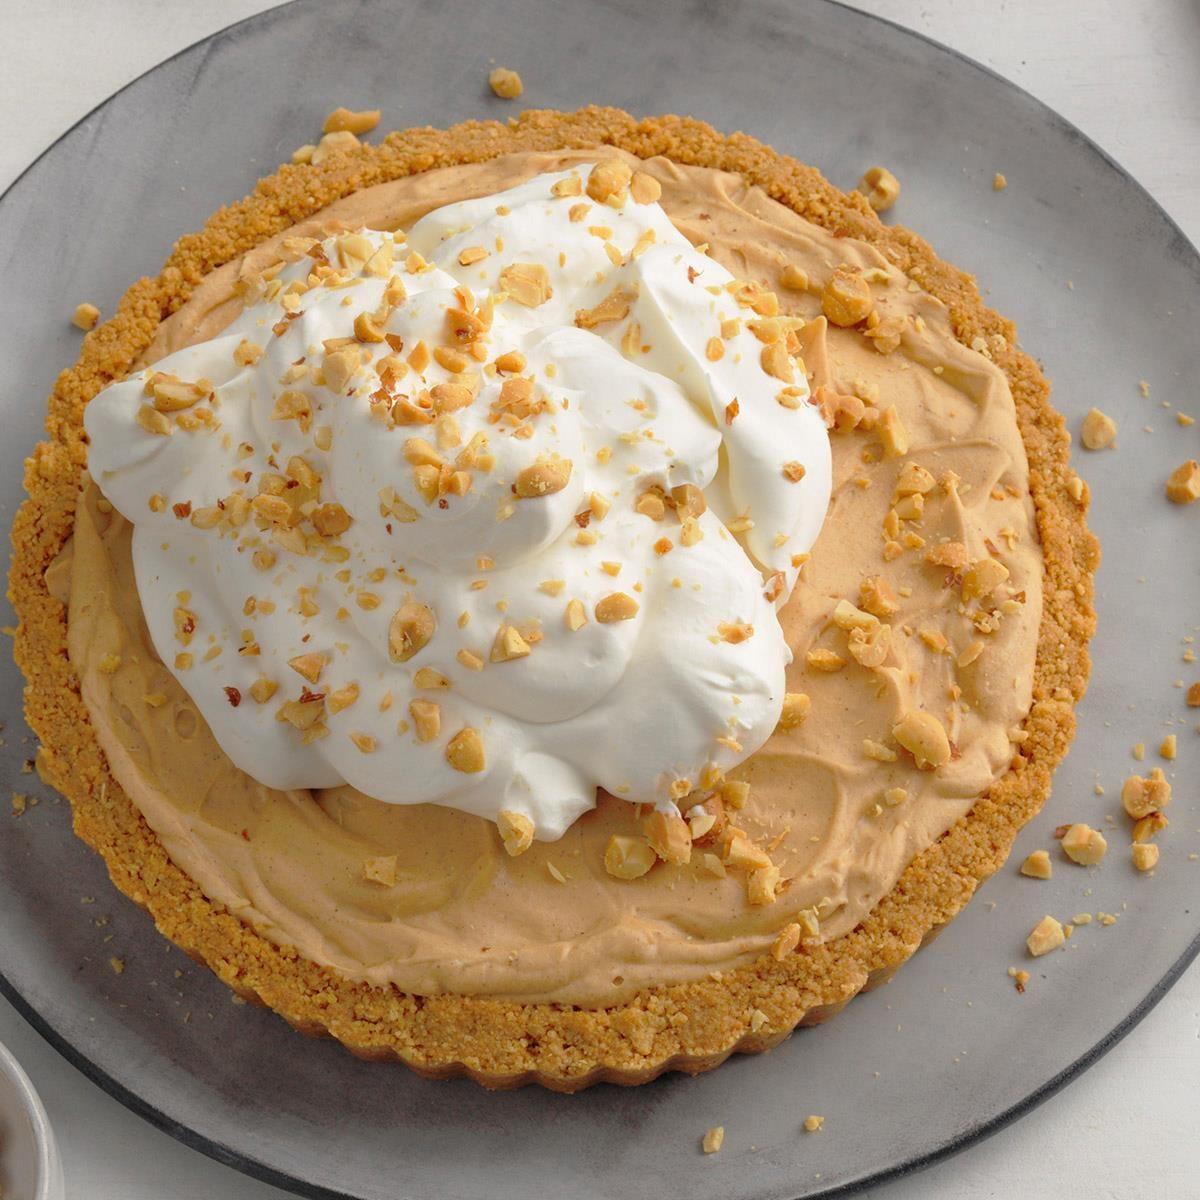 Cinnamon-Caramel Peanut Butter Tart